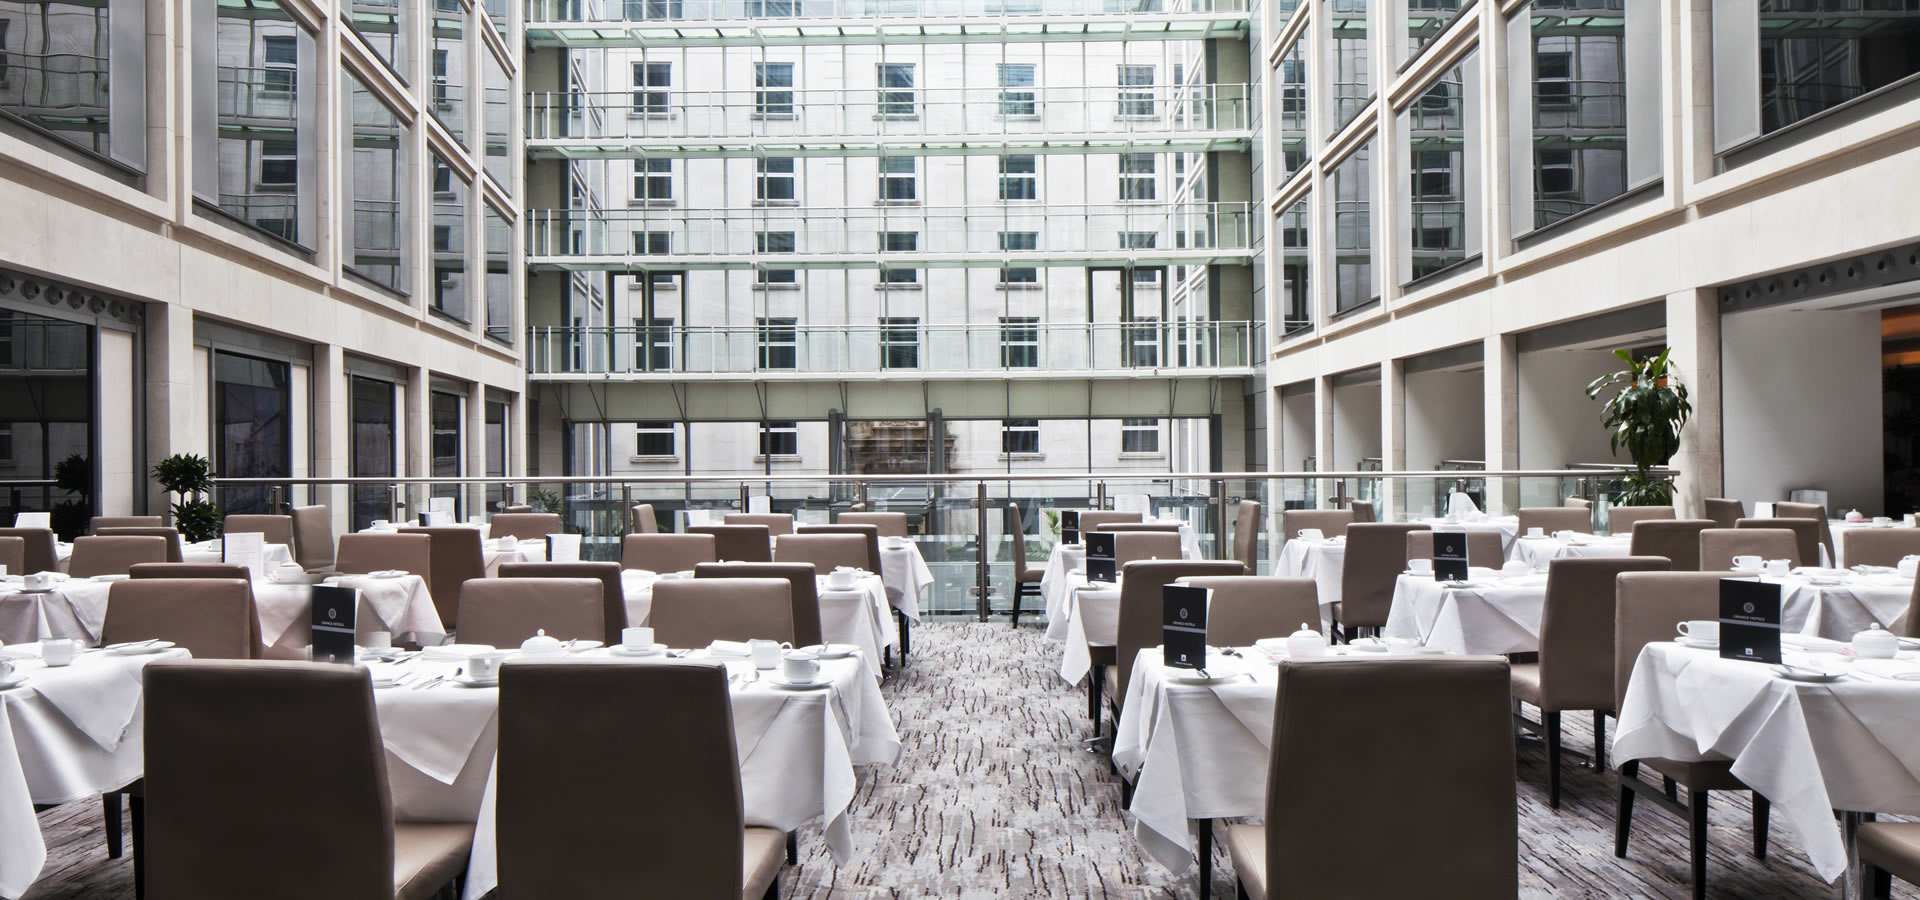 Hotels in st pauls london hotel near tate modern - The grange hotel restaurant ...